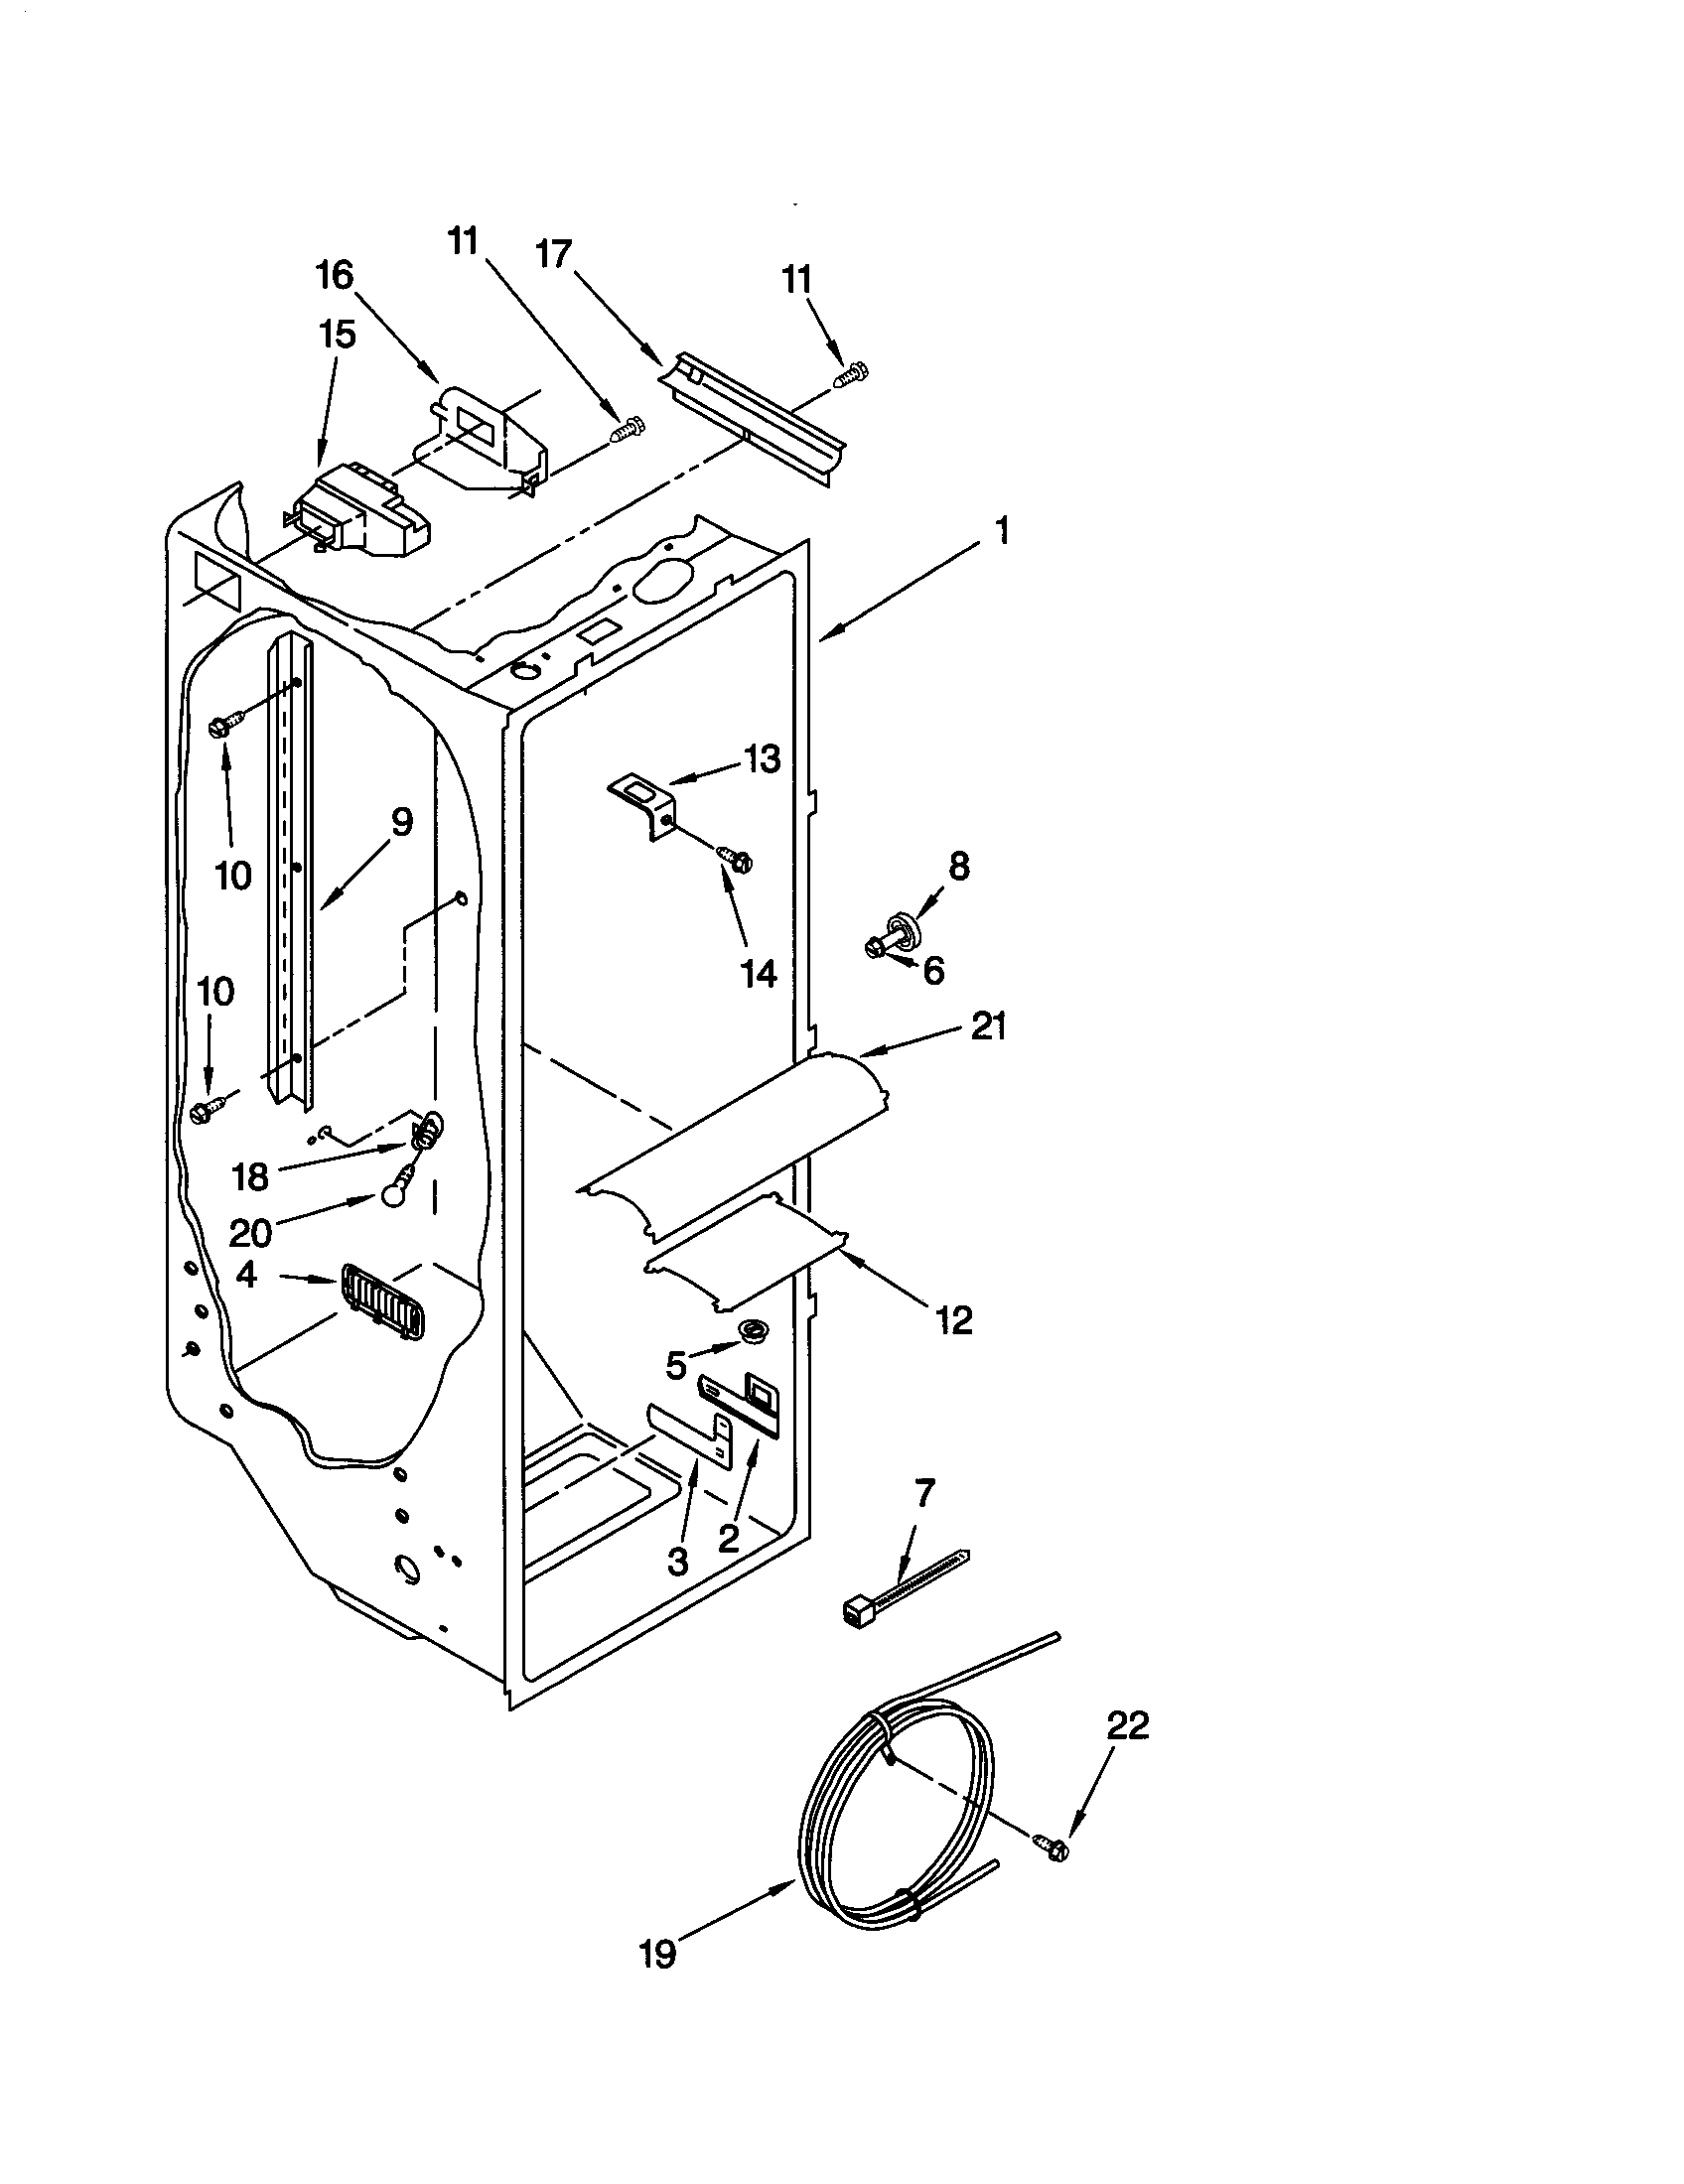 Kenmore-Elite model 10650593000 side-by-side refrigerator